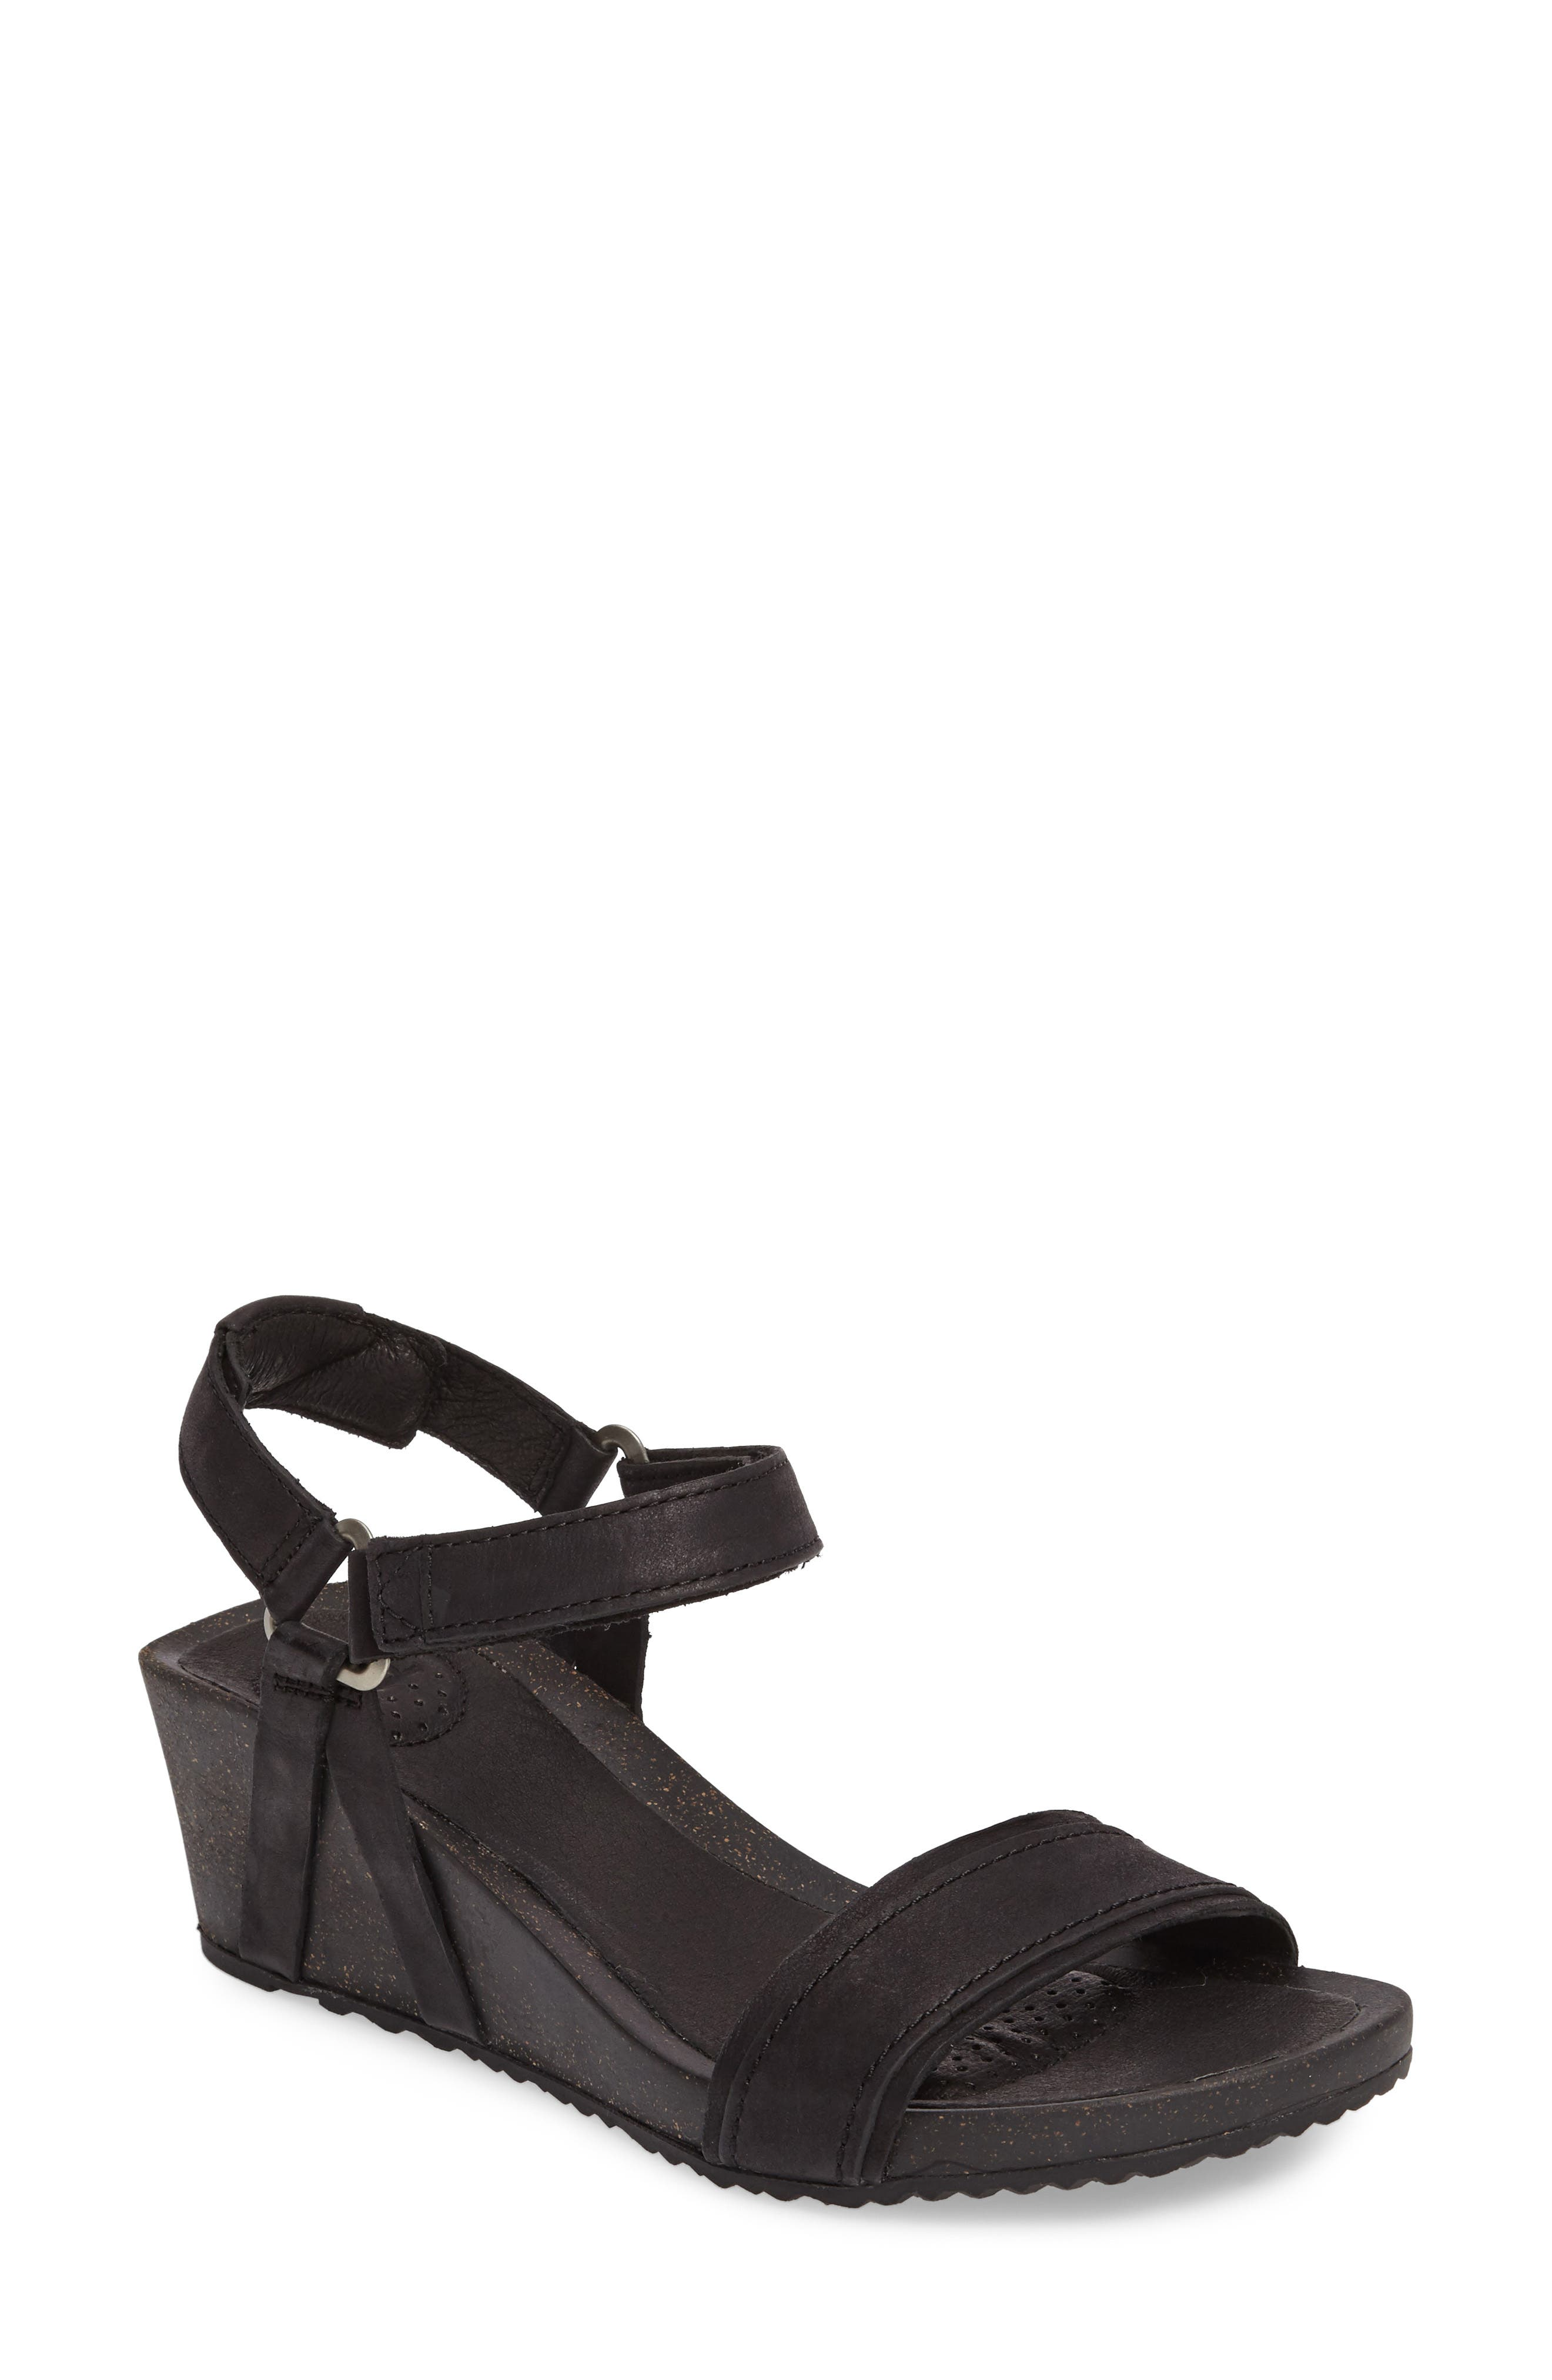 TEVA Ysidro Stitch Wedge Sandal, Main, color, 001